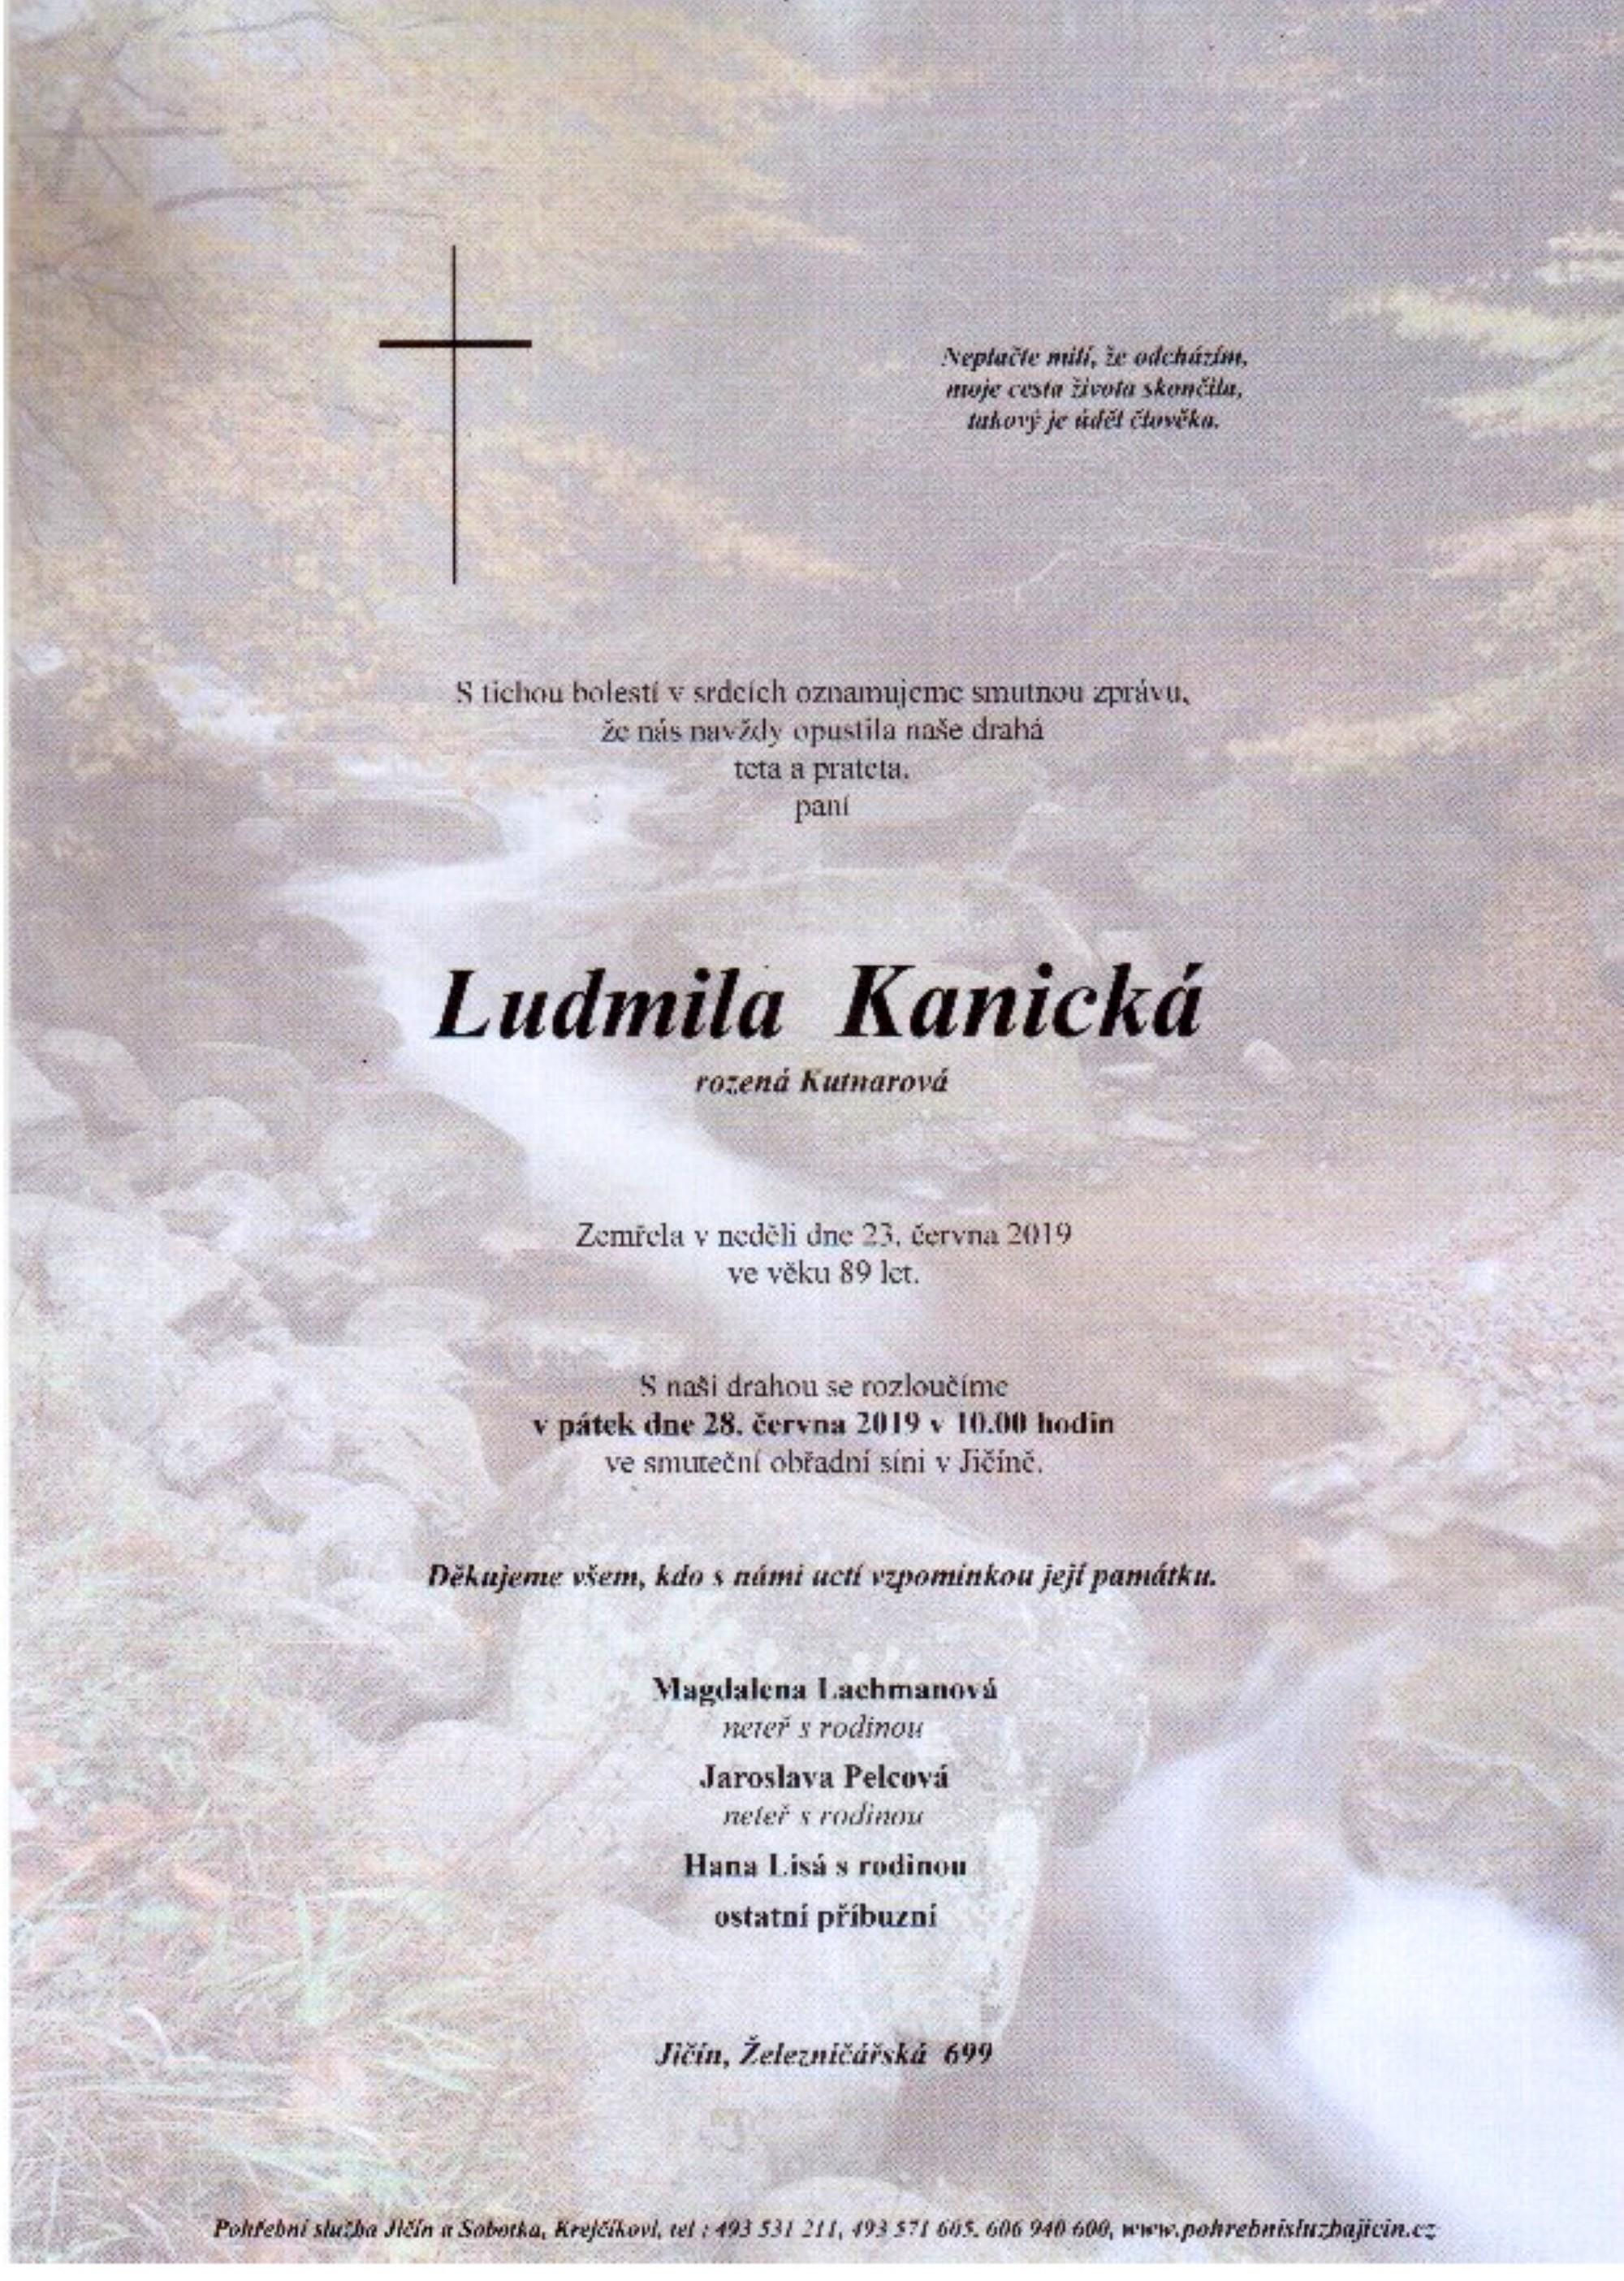 Ludmila Kanická